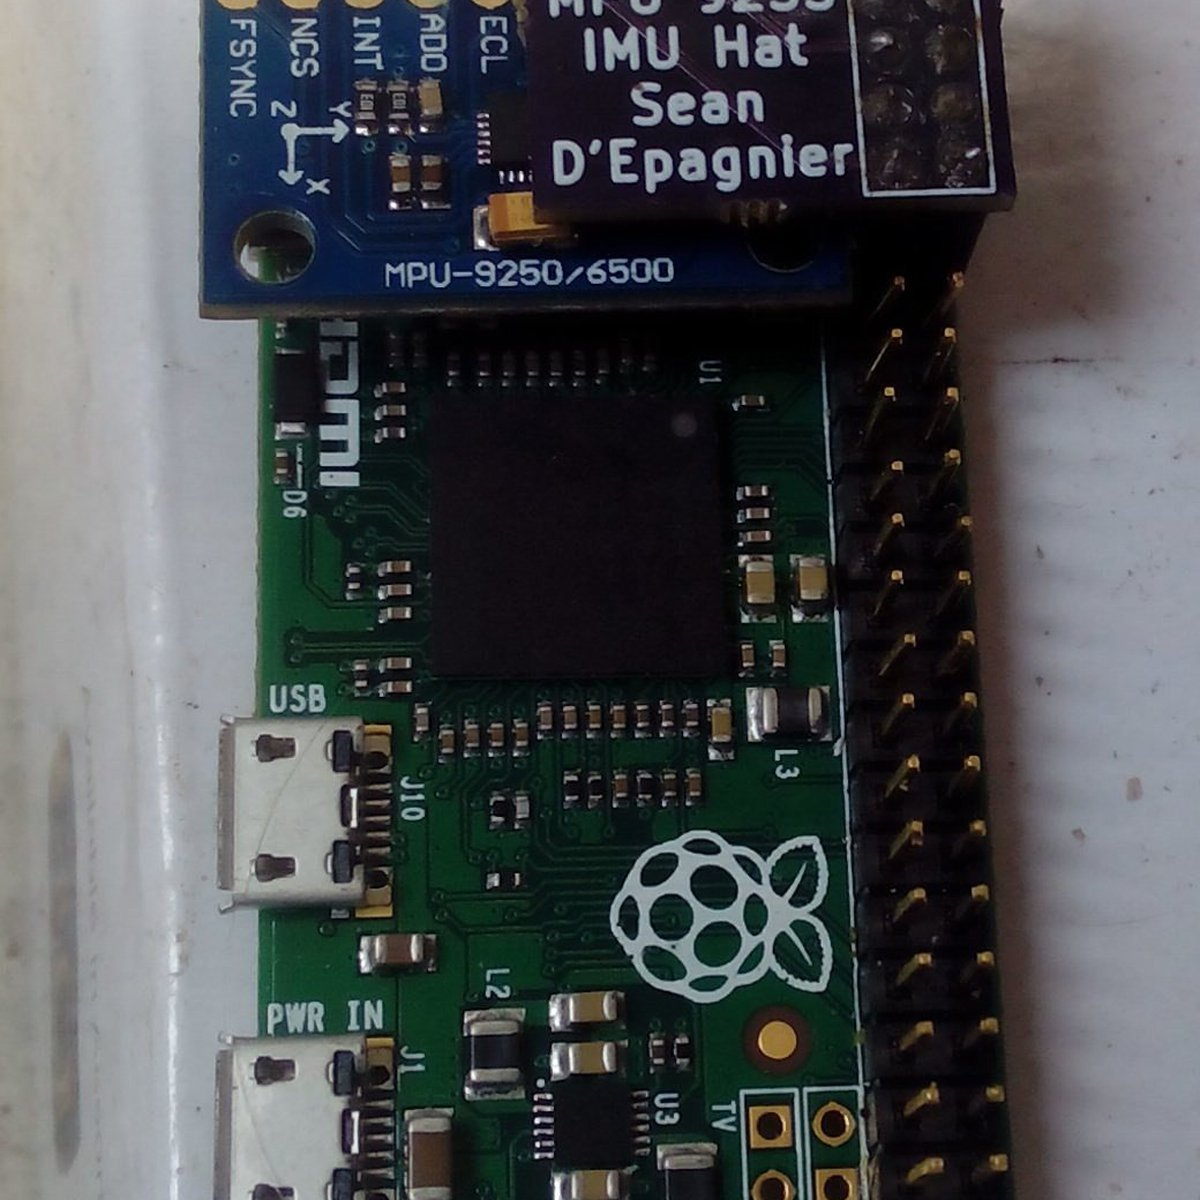 raspberry pi imu hat mpu9255 from Sean D'Epagnier on Tindie